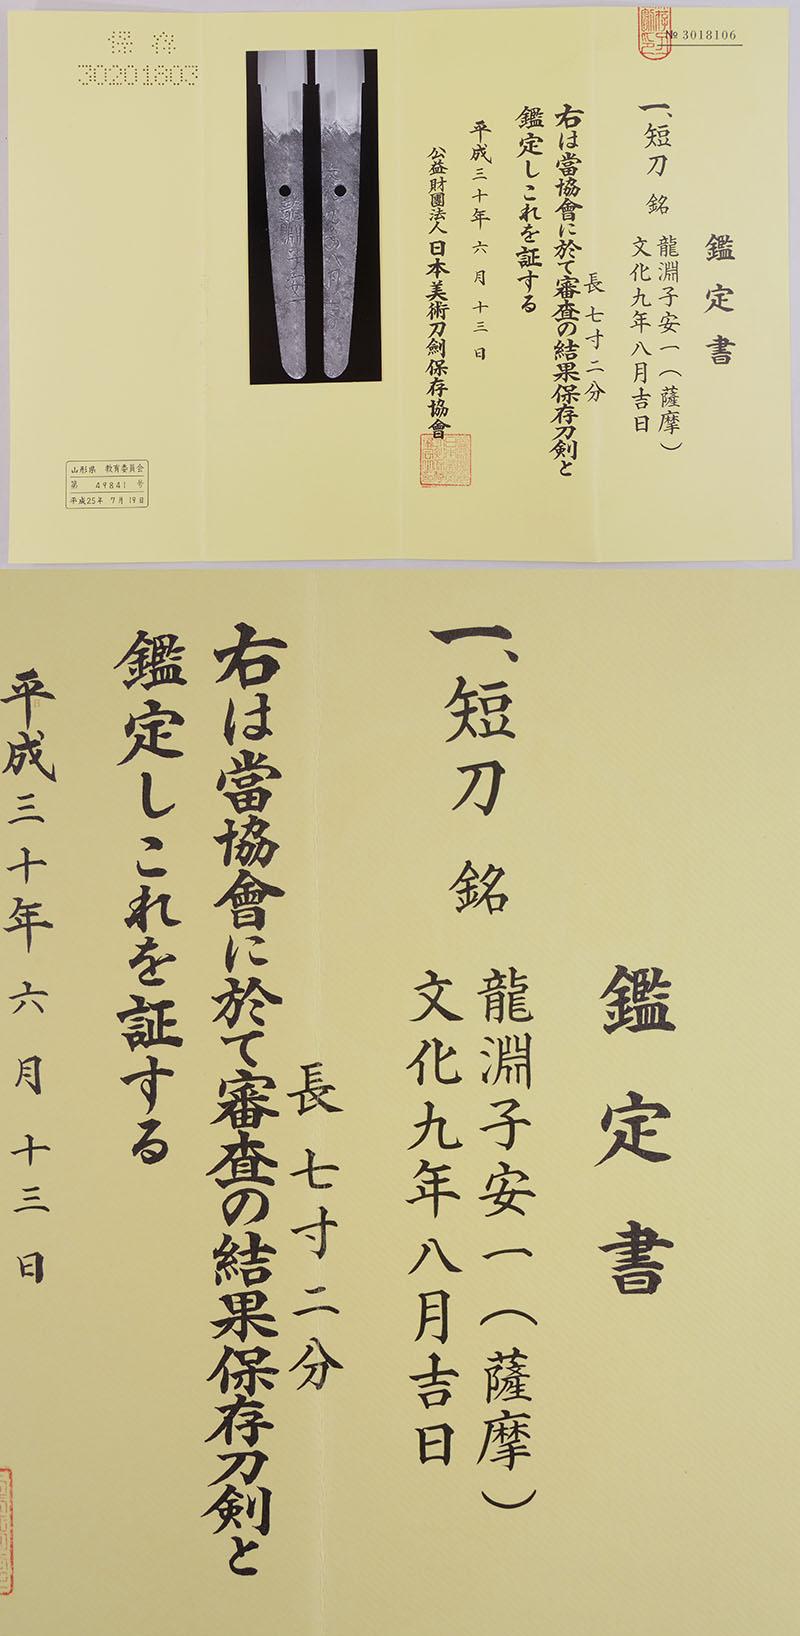 龍淵子安一(薩摩) Picture of Certificate